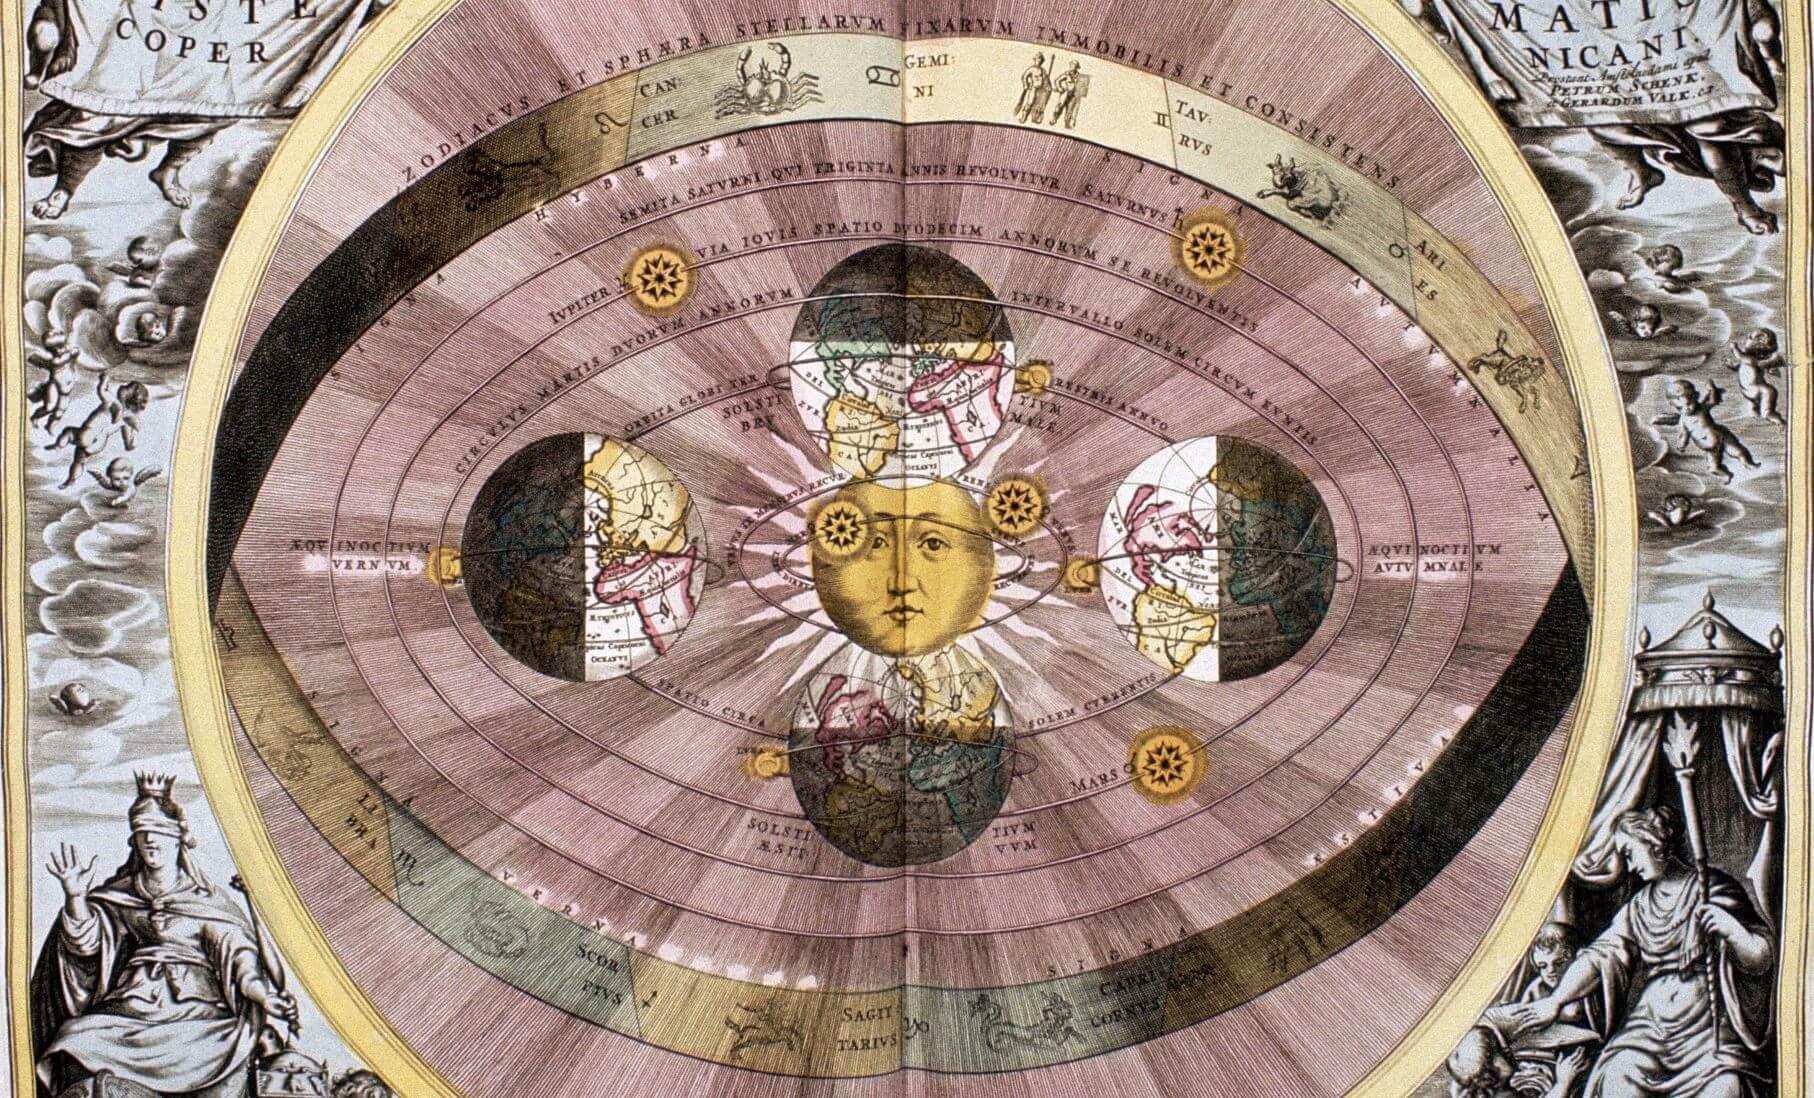 Copernican diagram of universe